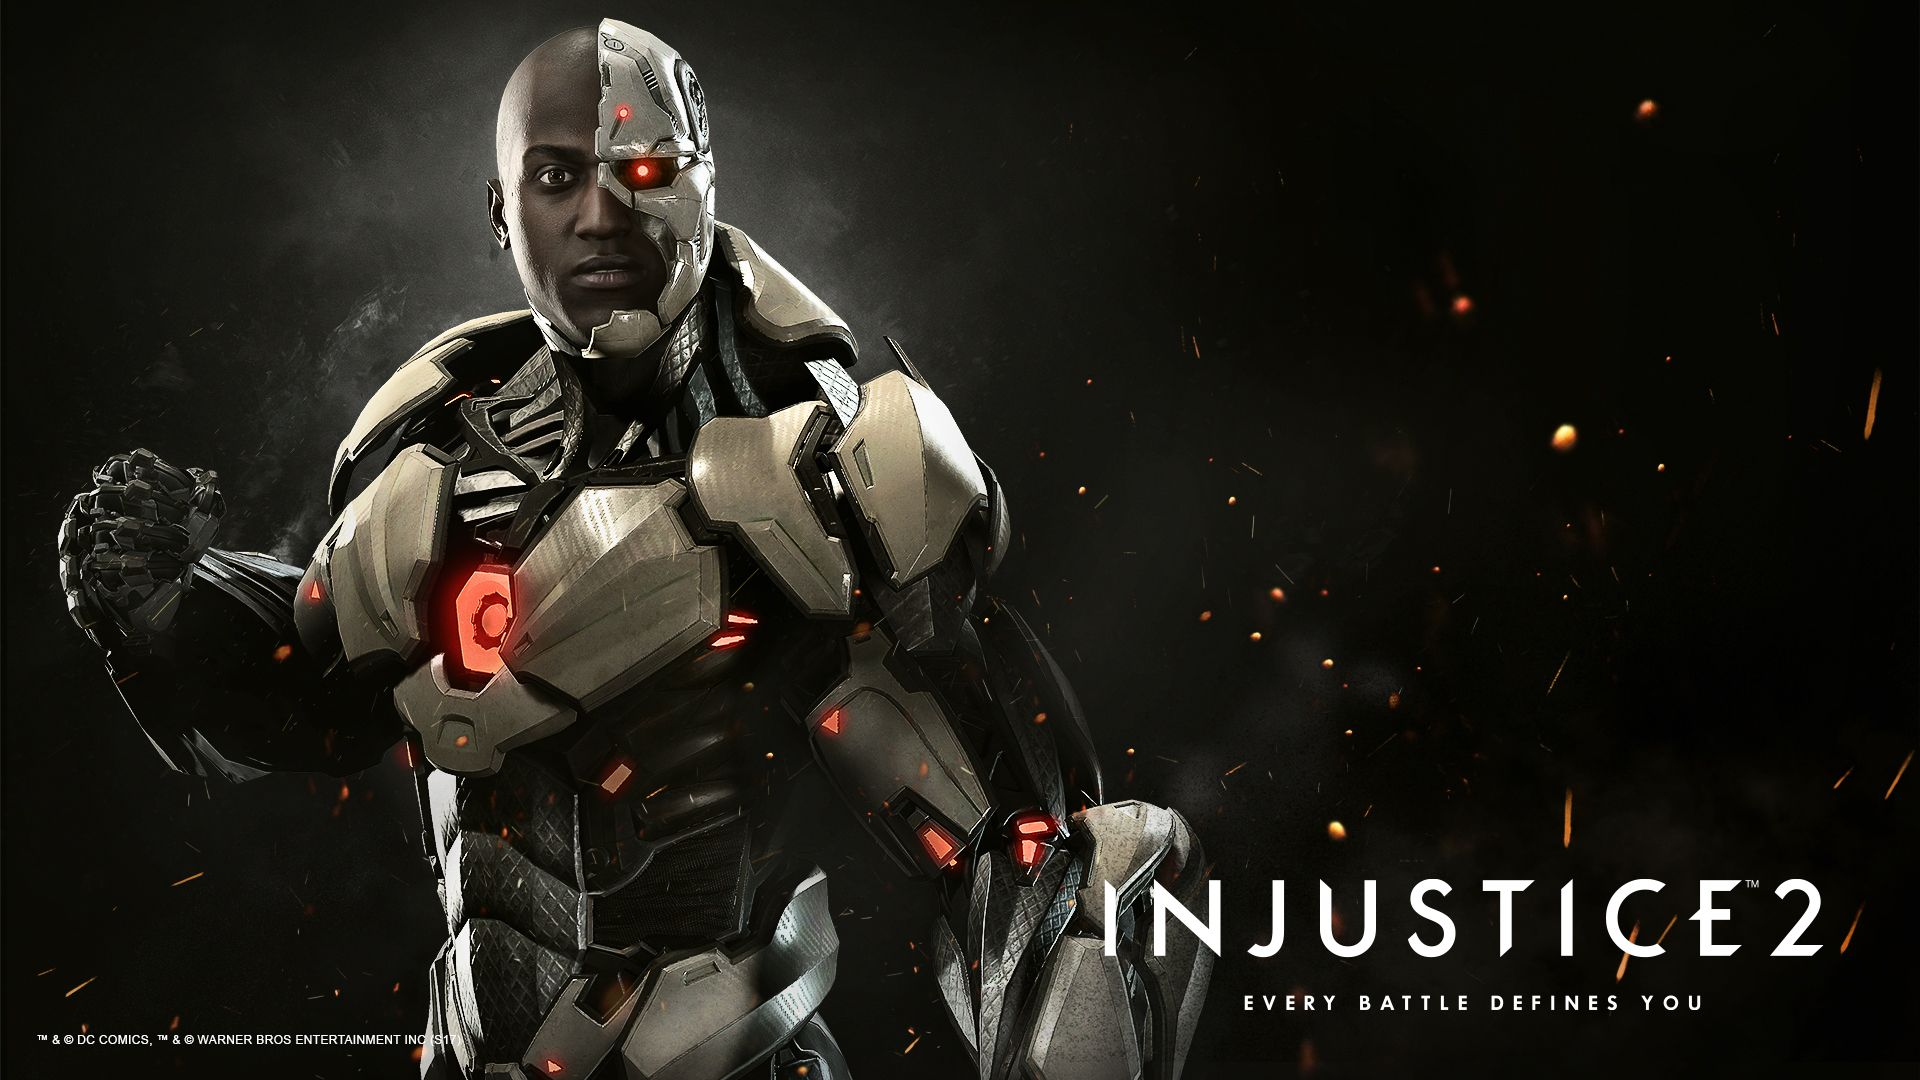 Injustice Cyborg Wallpaper X  Jpg